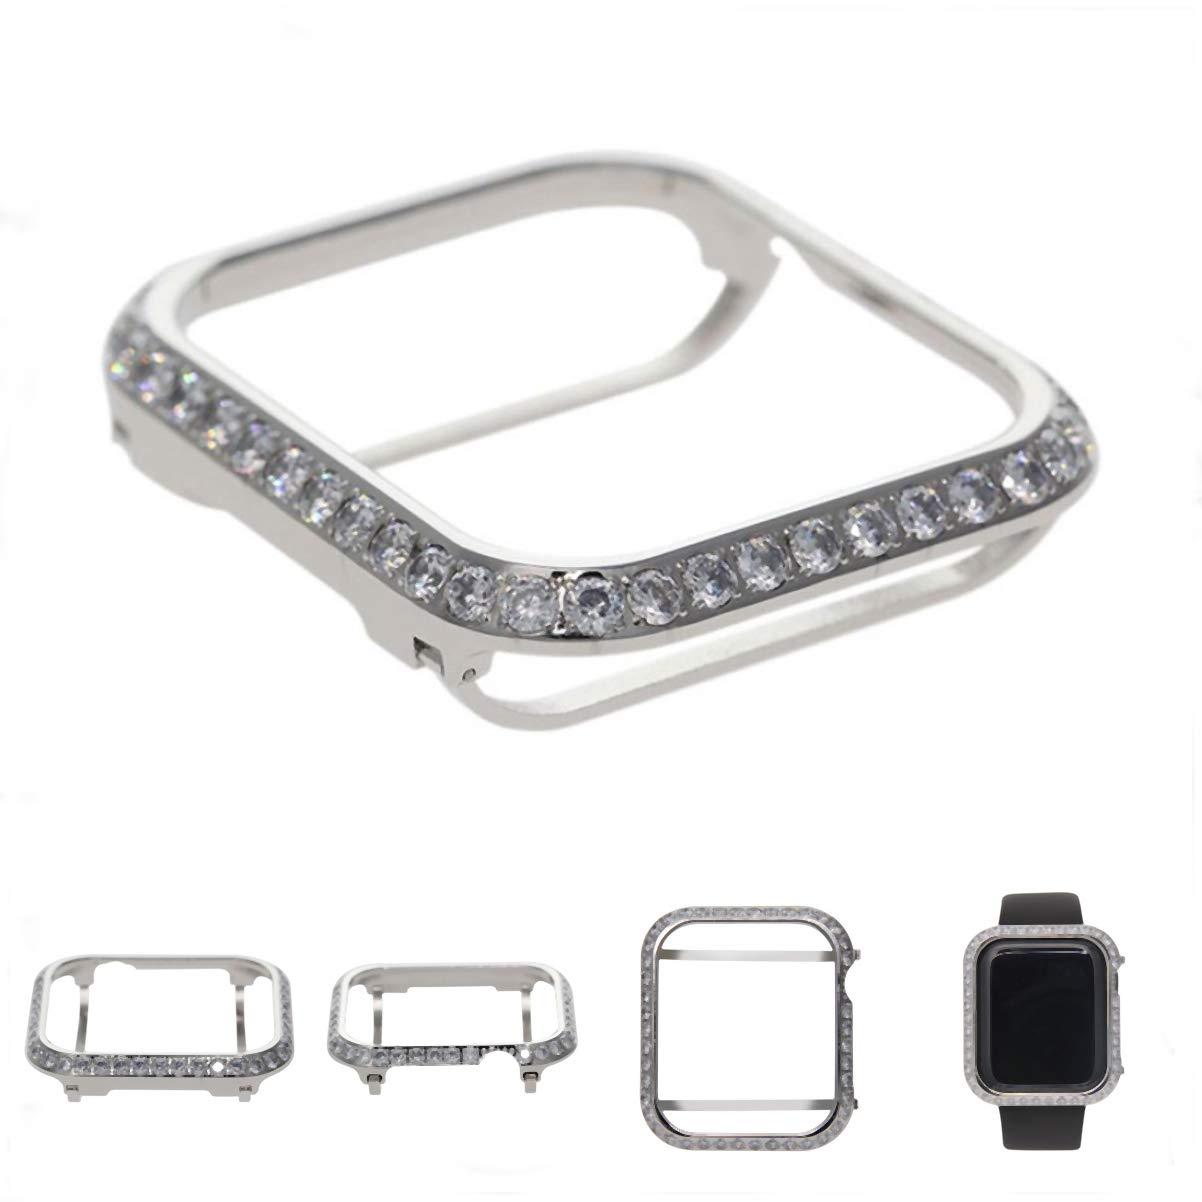 HJIN 3.0mm Bling spakling Bling Rhinestone Diamond Zircon Crystal case Cover Bezel Handwork Inlaid Compatible Apple Watch Series 4 Series 3 2 1 (Platinum, 44mm) by HJIN